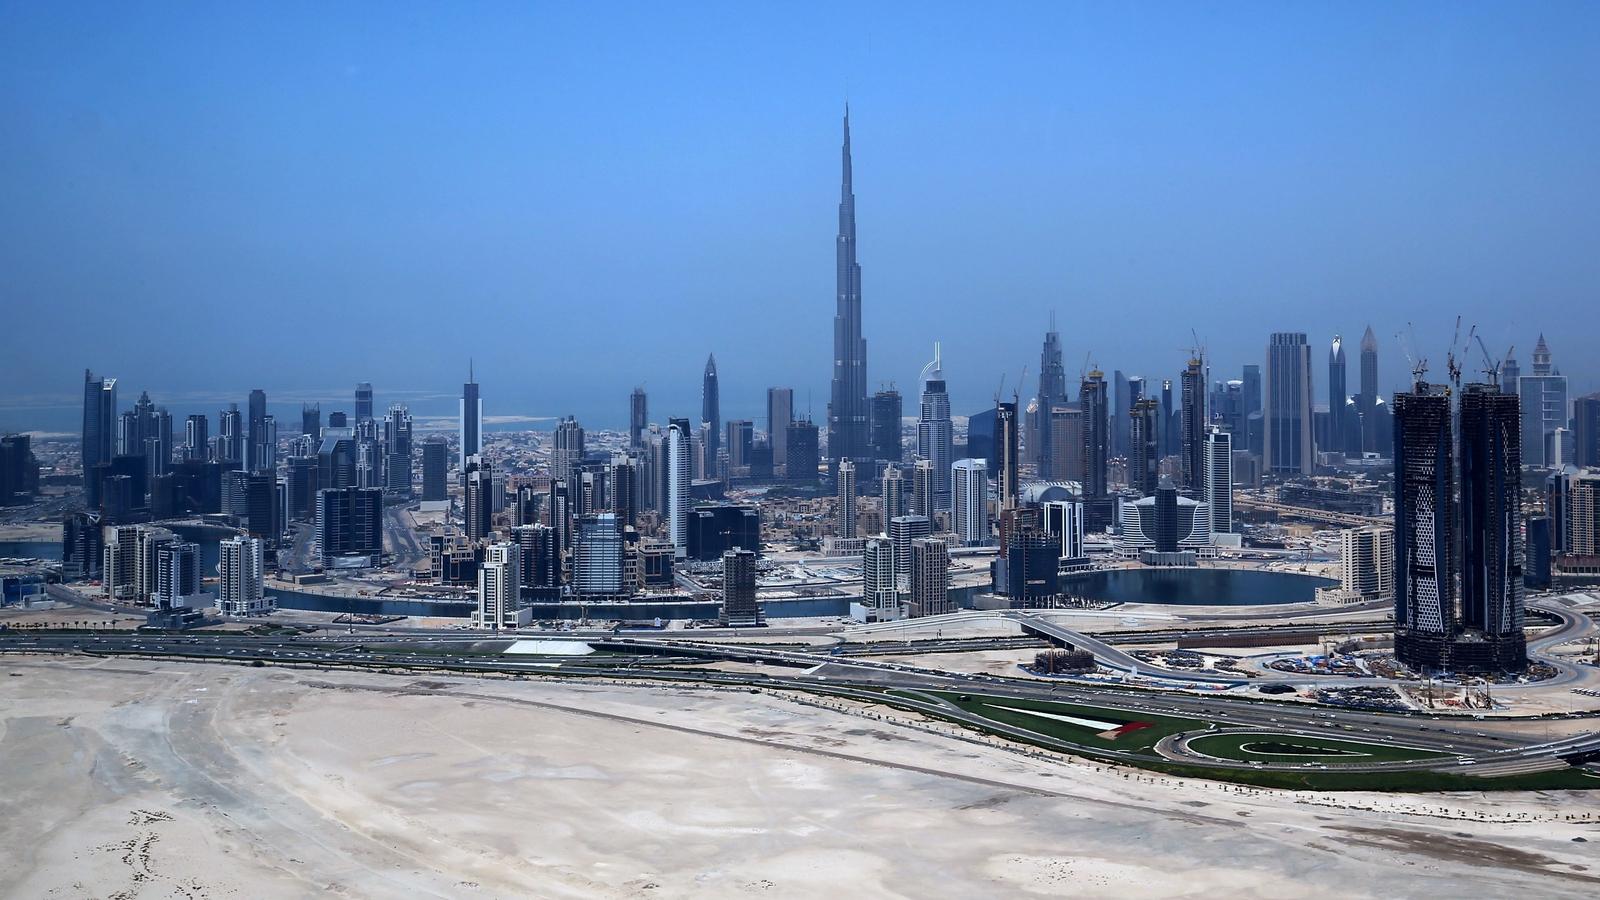 Image - Dubai